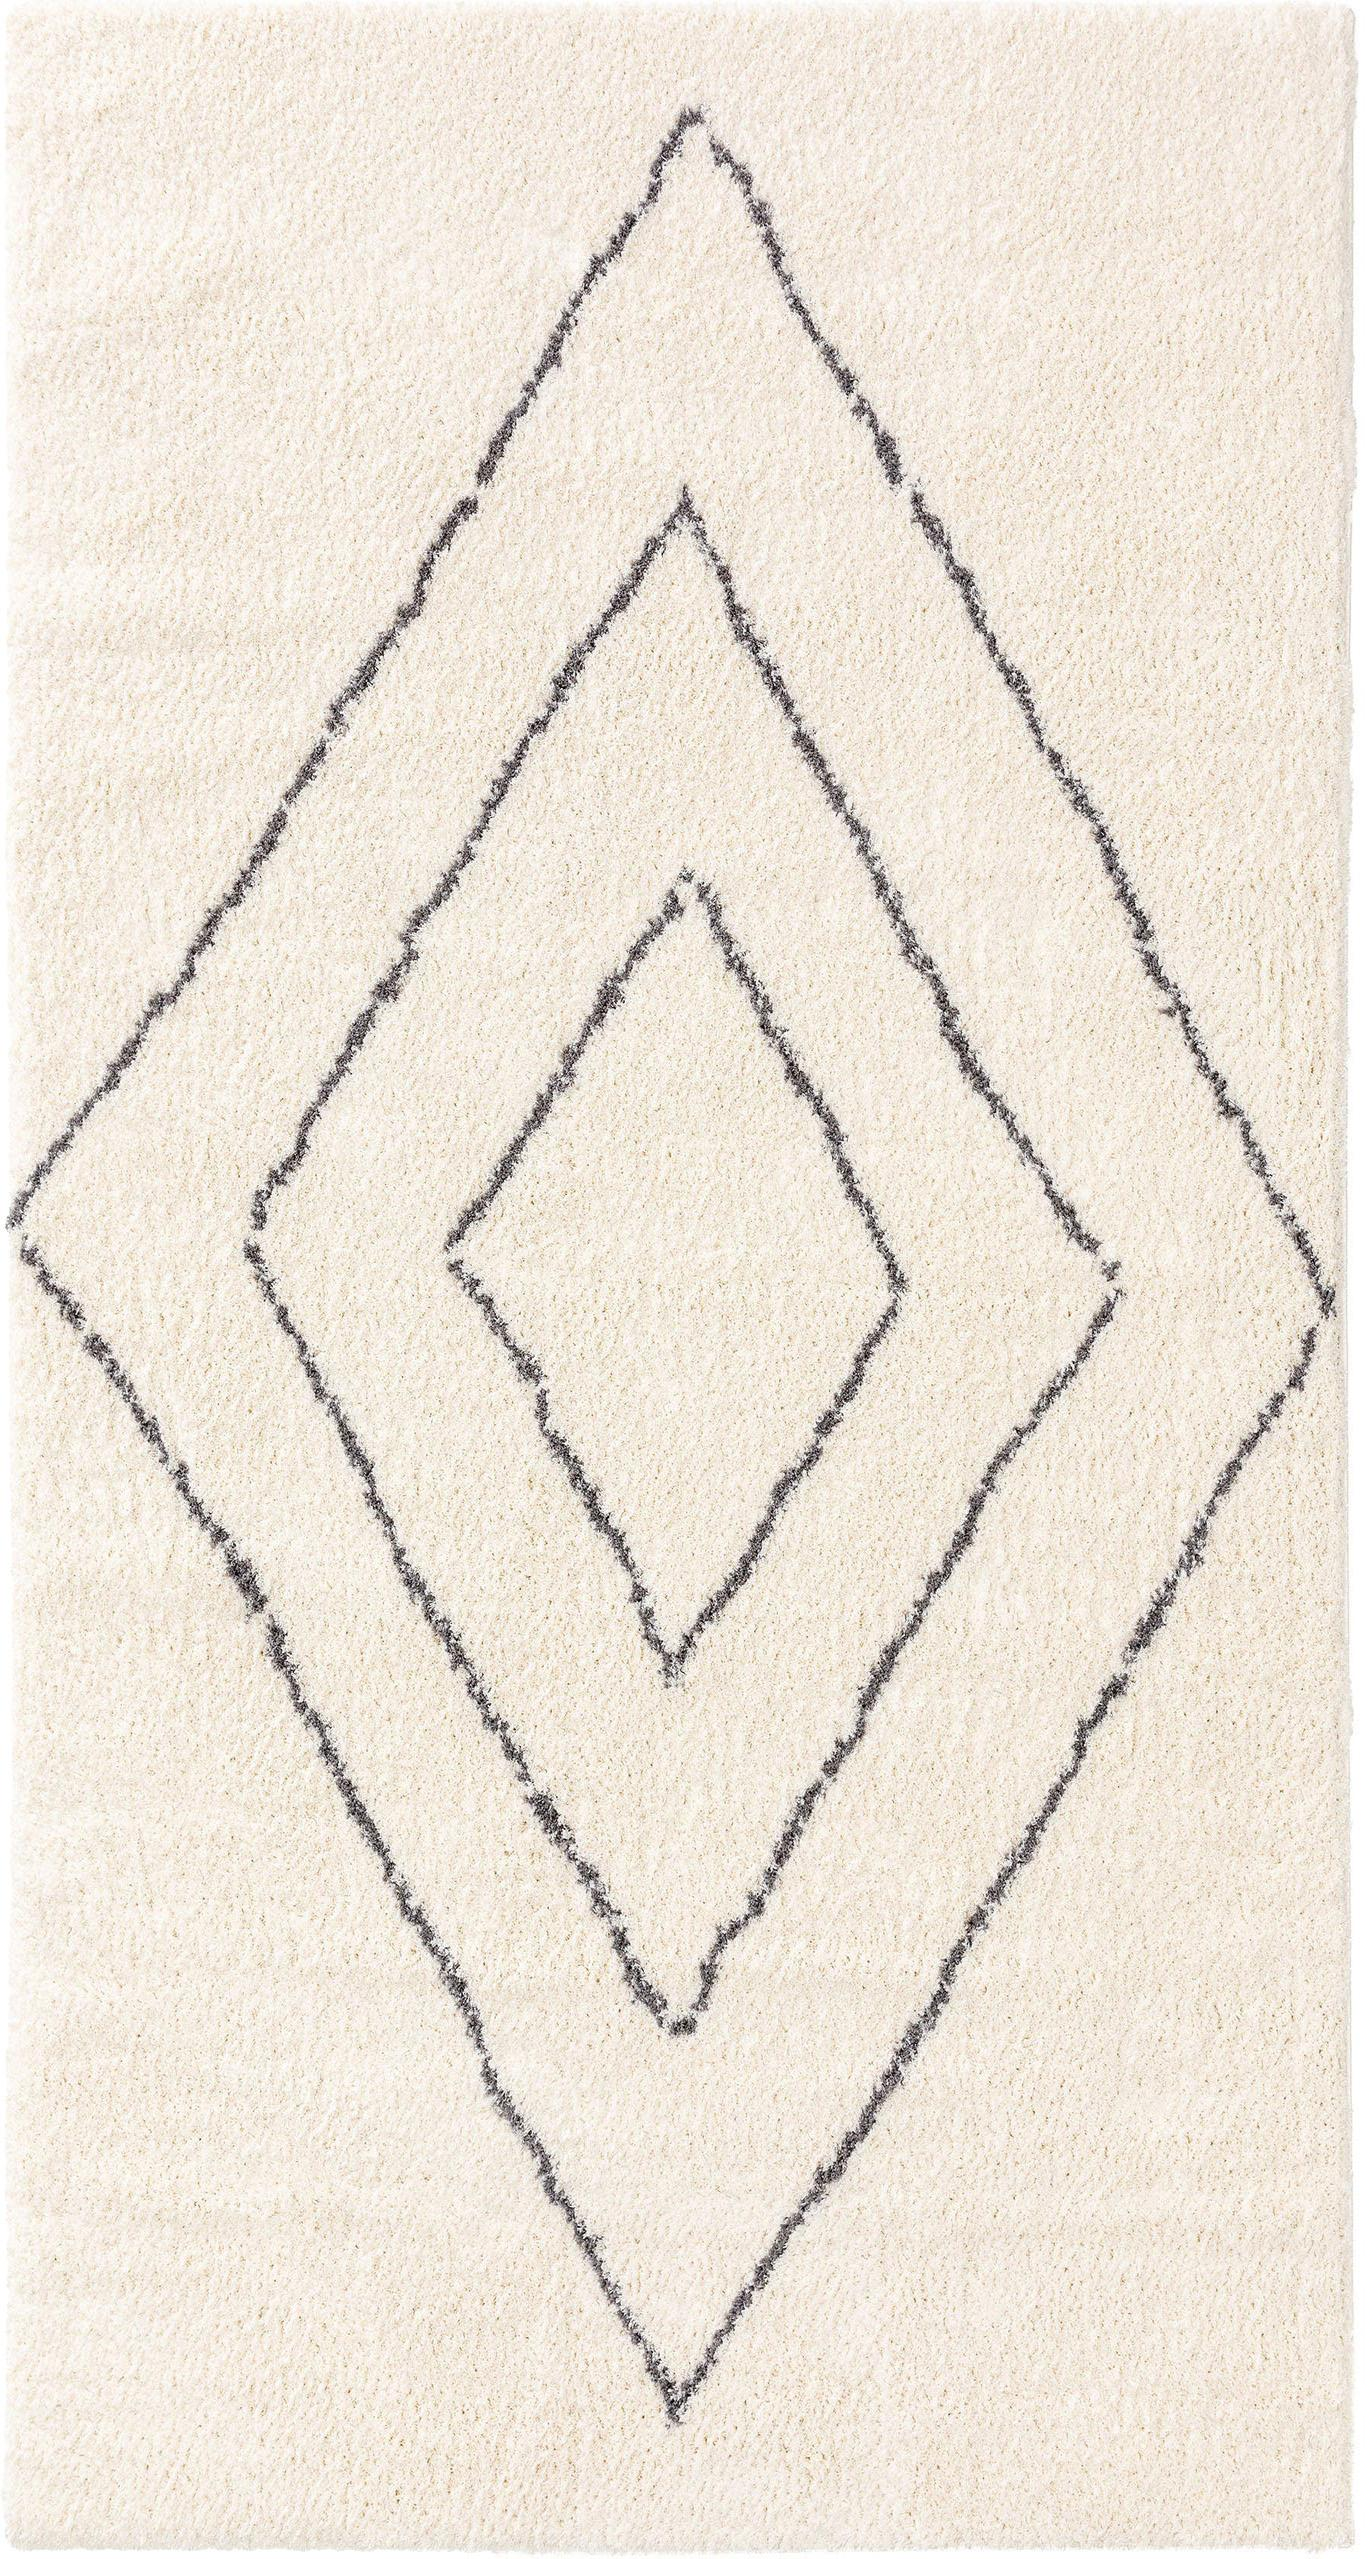 Alfombra de pelo largo Benno, 100%poliéster, Crema, gris oscuro, An 80 x L 150 cm (Tamaño XS)